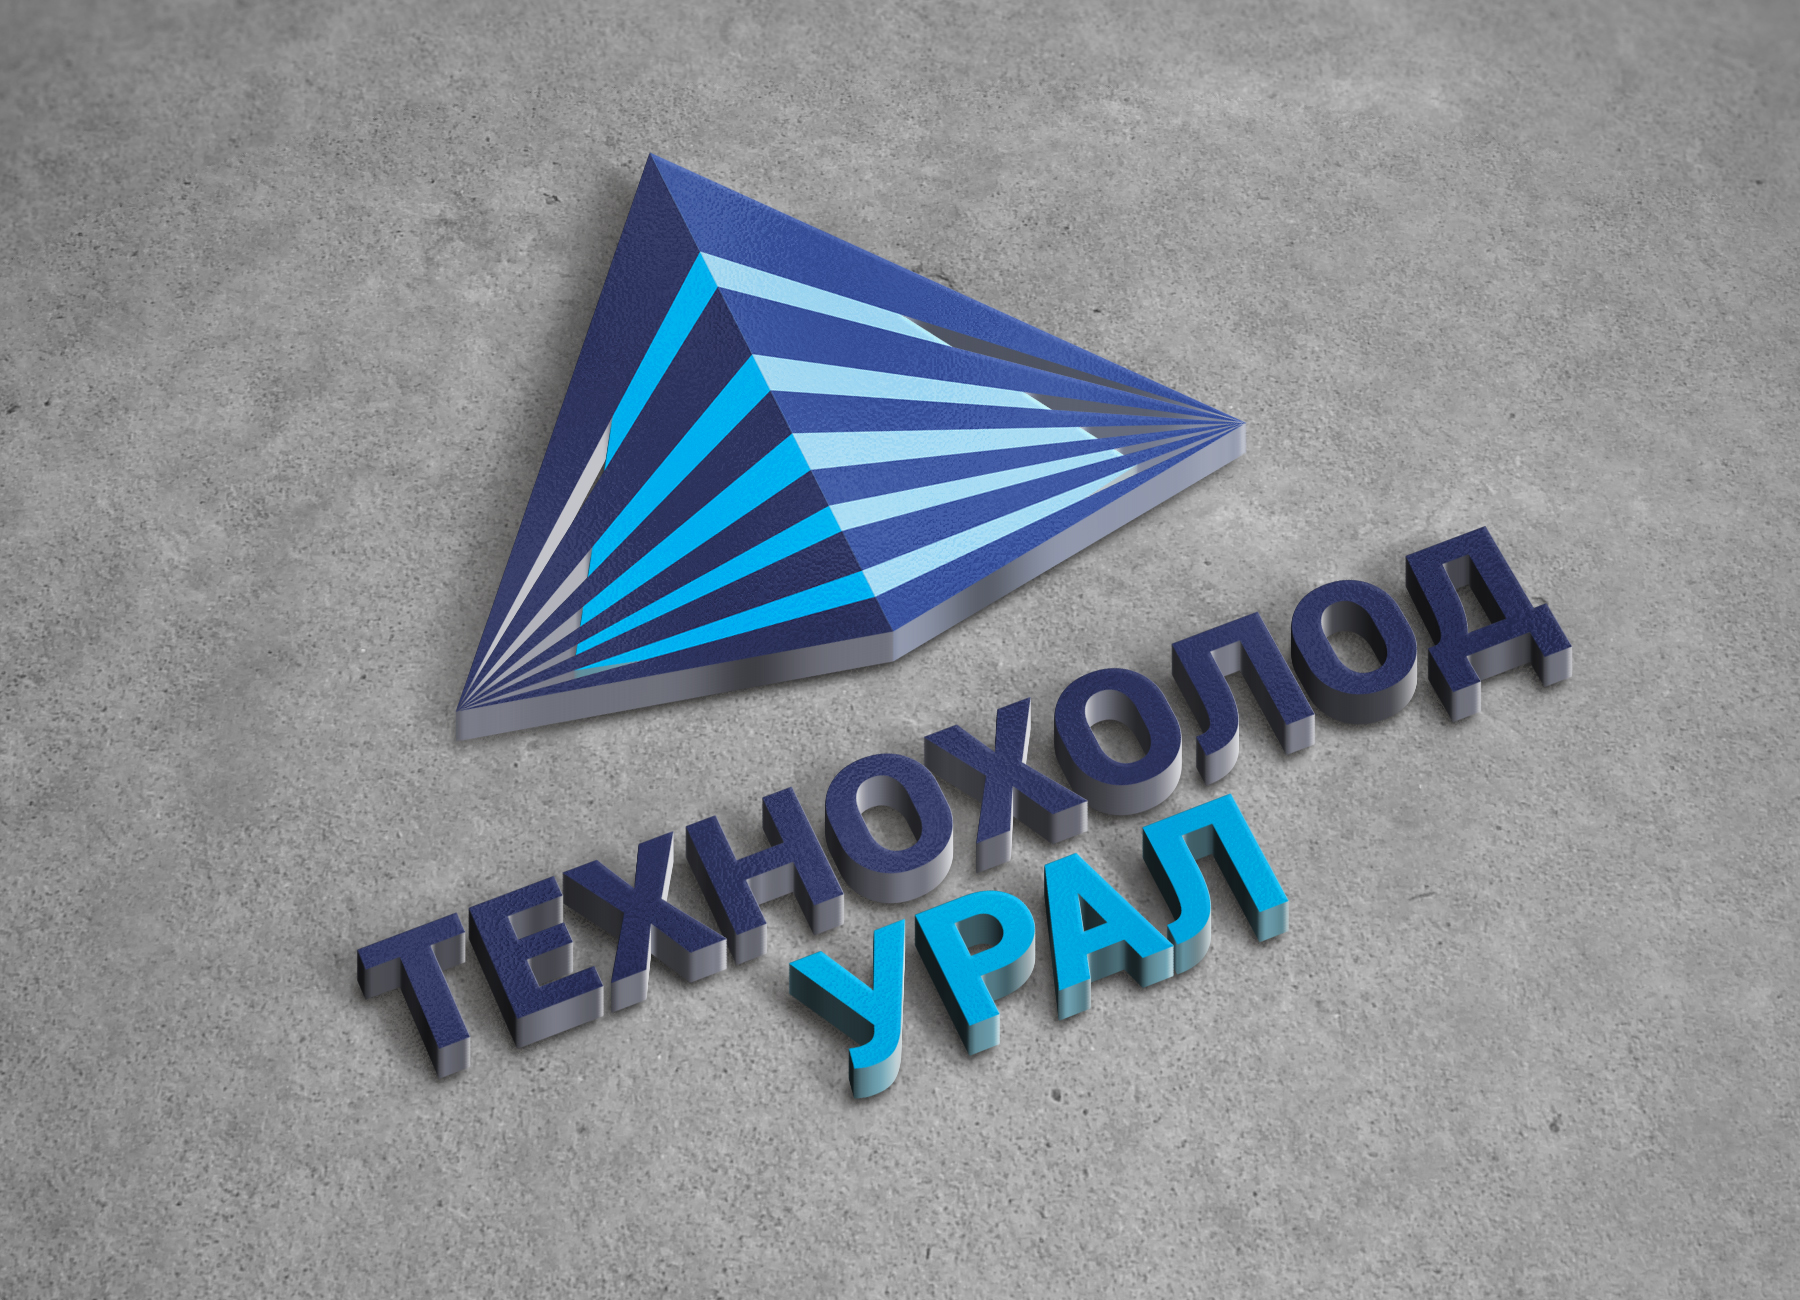 Технохолод Урал - разработка логотипа